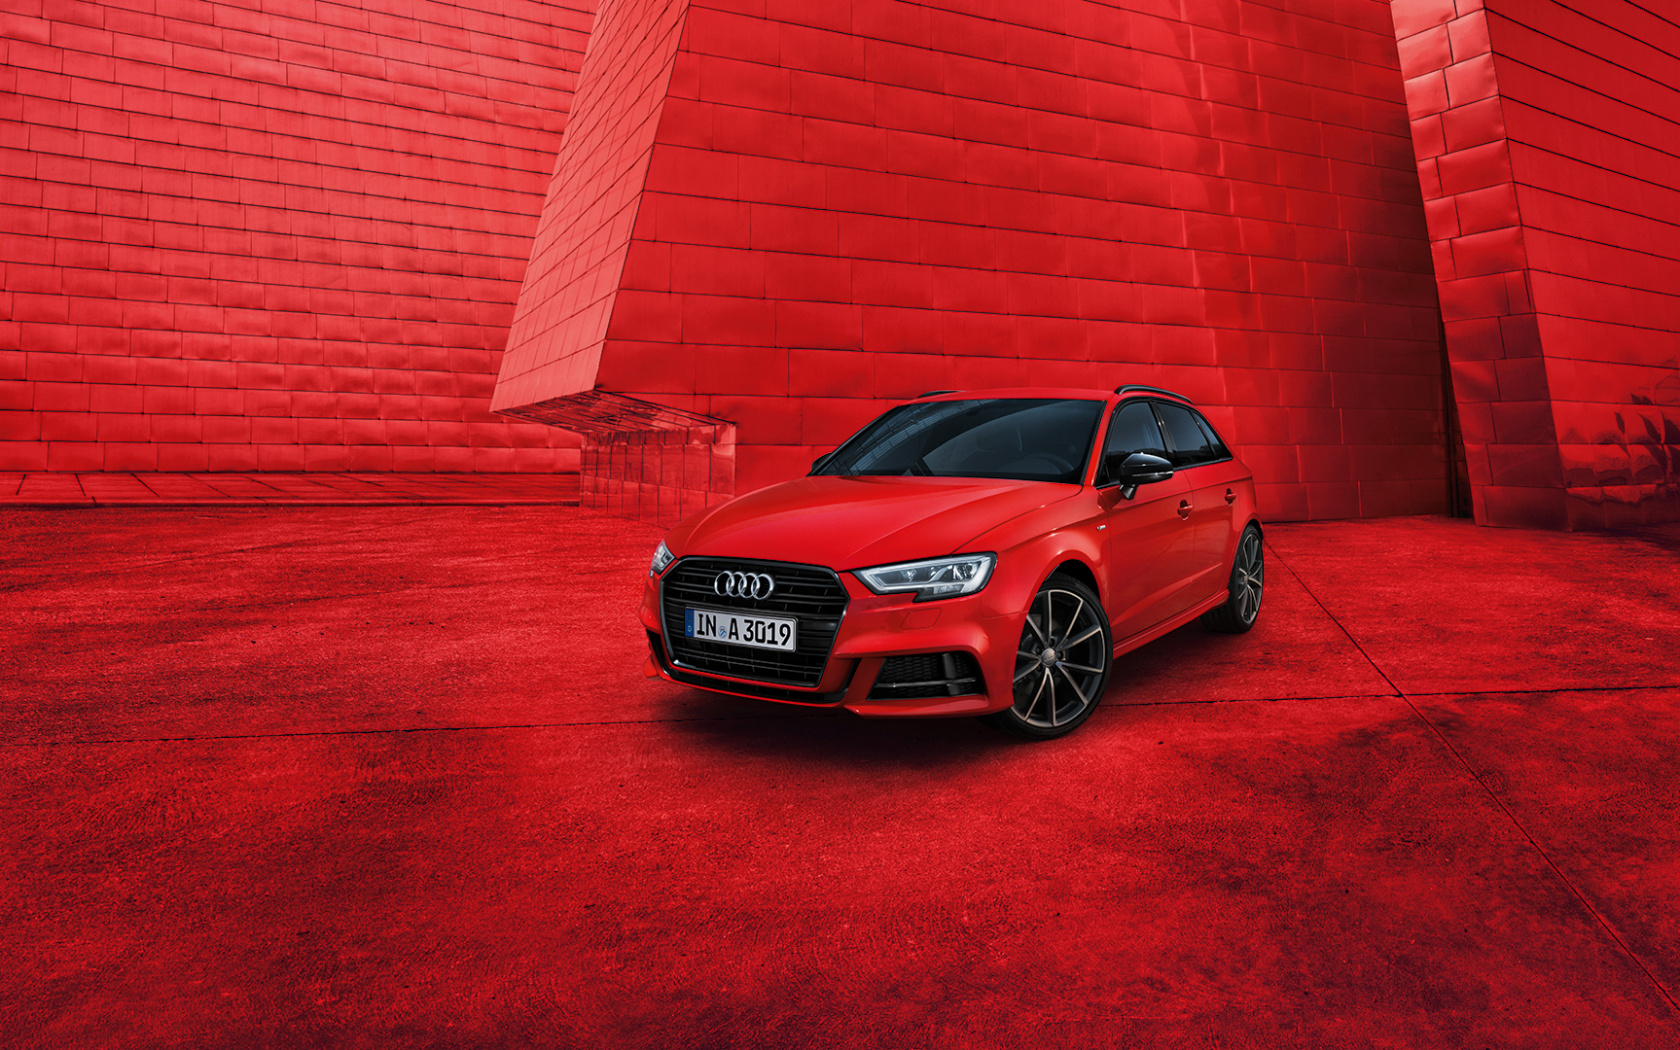 Light Audi Family Car Car Audi Rs3 Sportback Wallpaper Audi A3 Black Line Edition 2179167 Hd Wallpaper Backgrounds Download